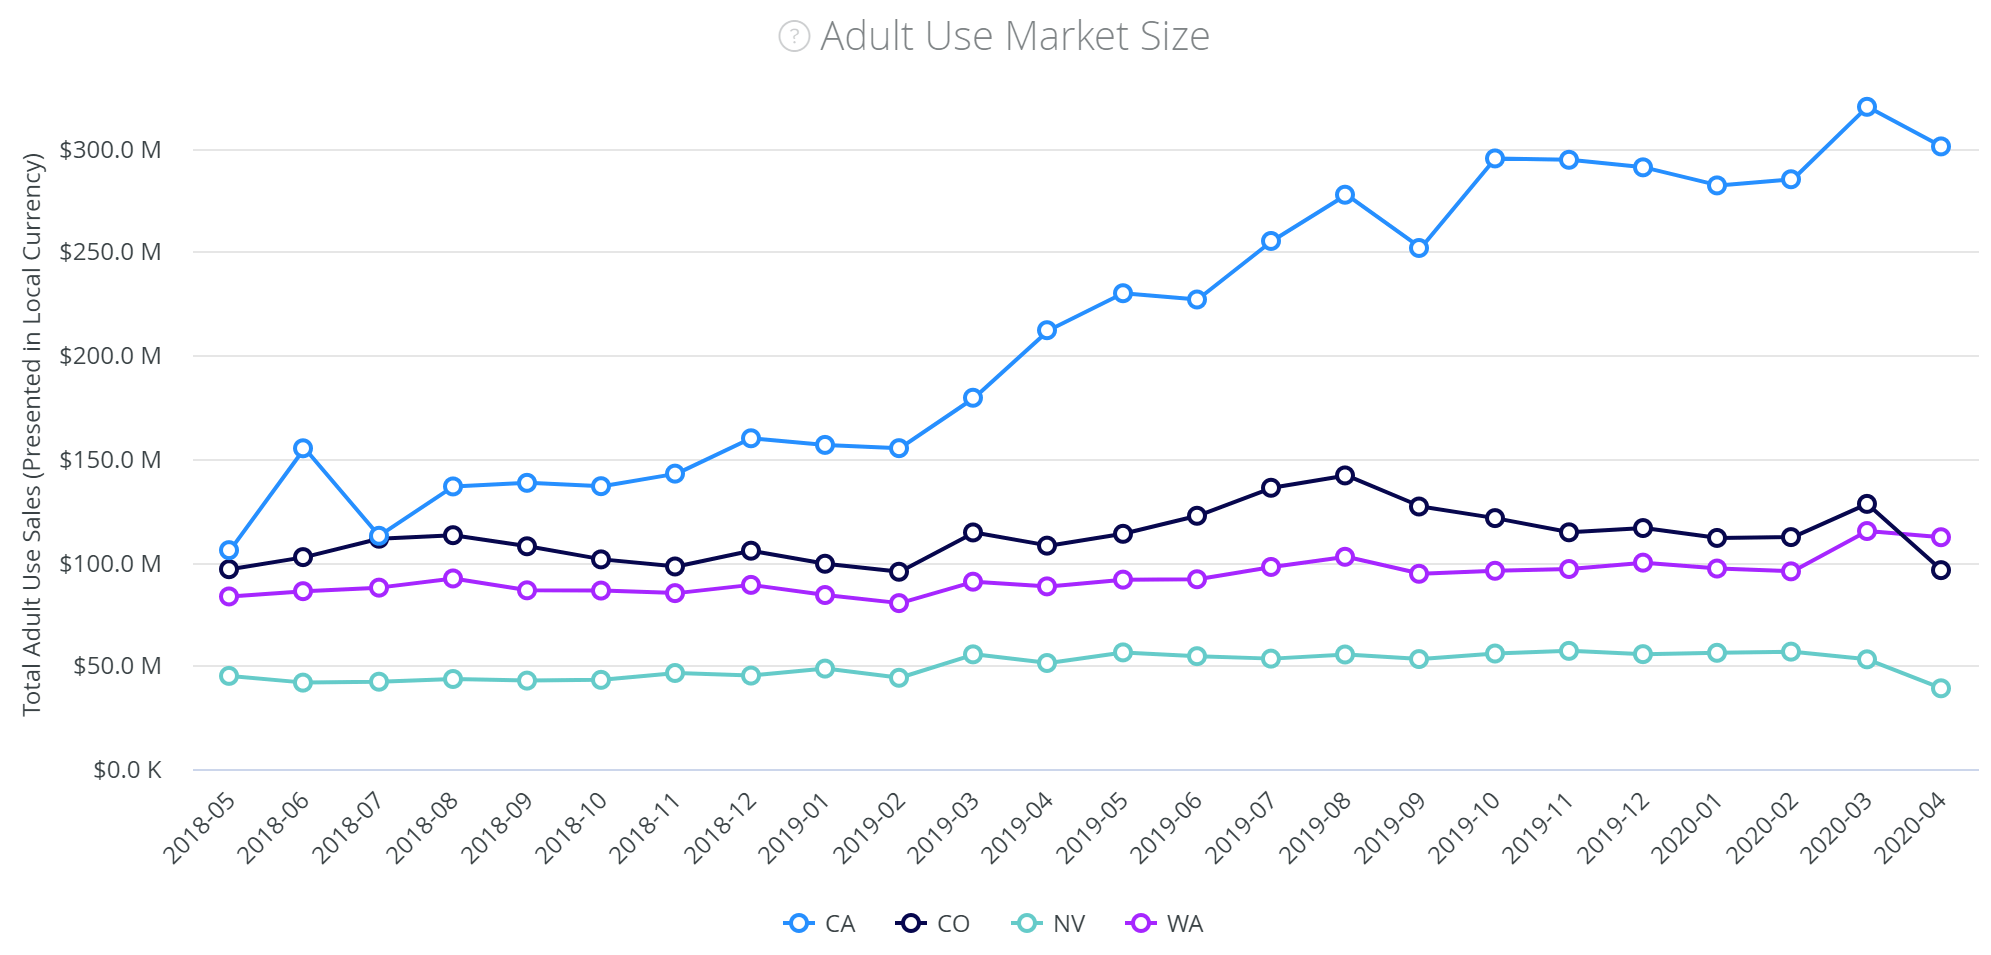 Find cannabis market growth rates by region